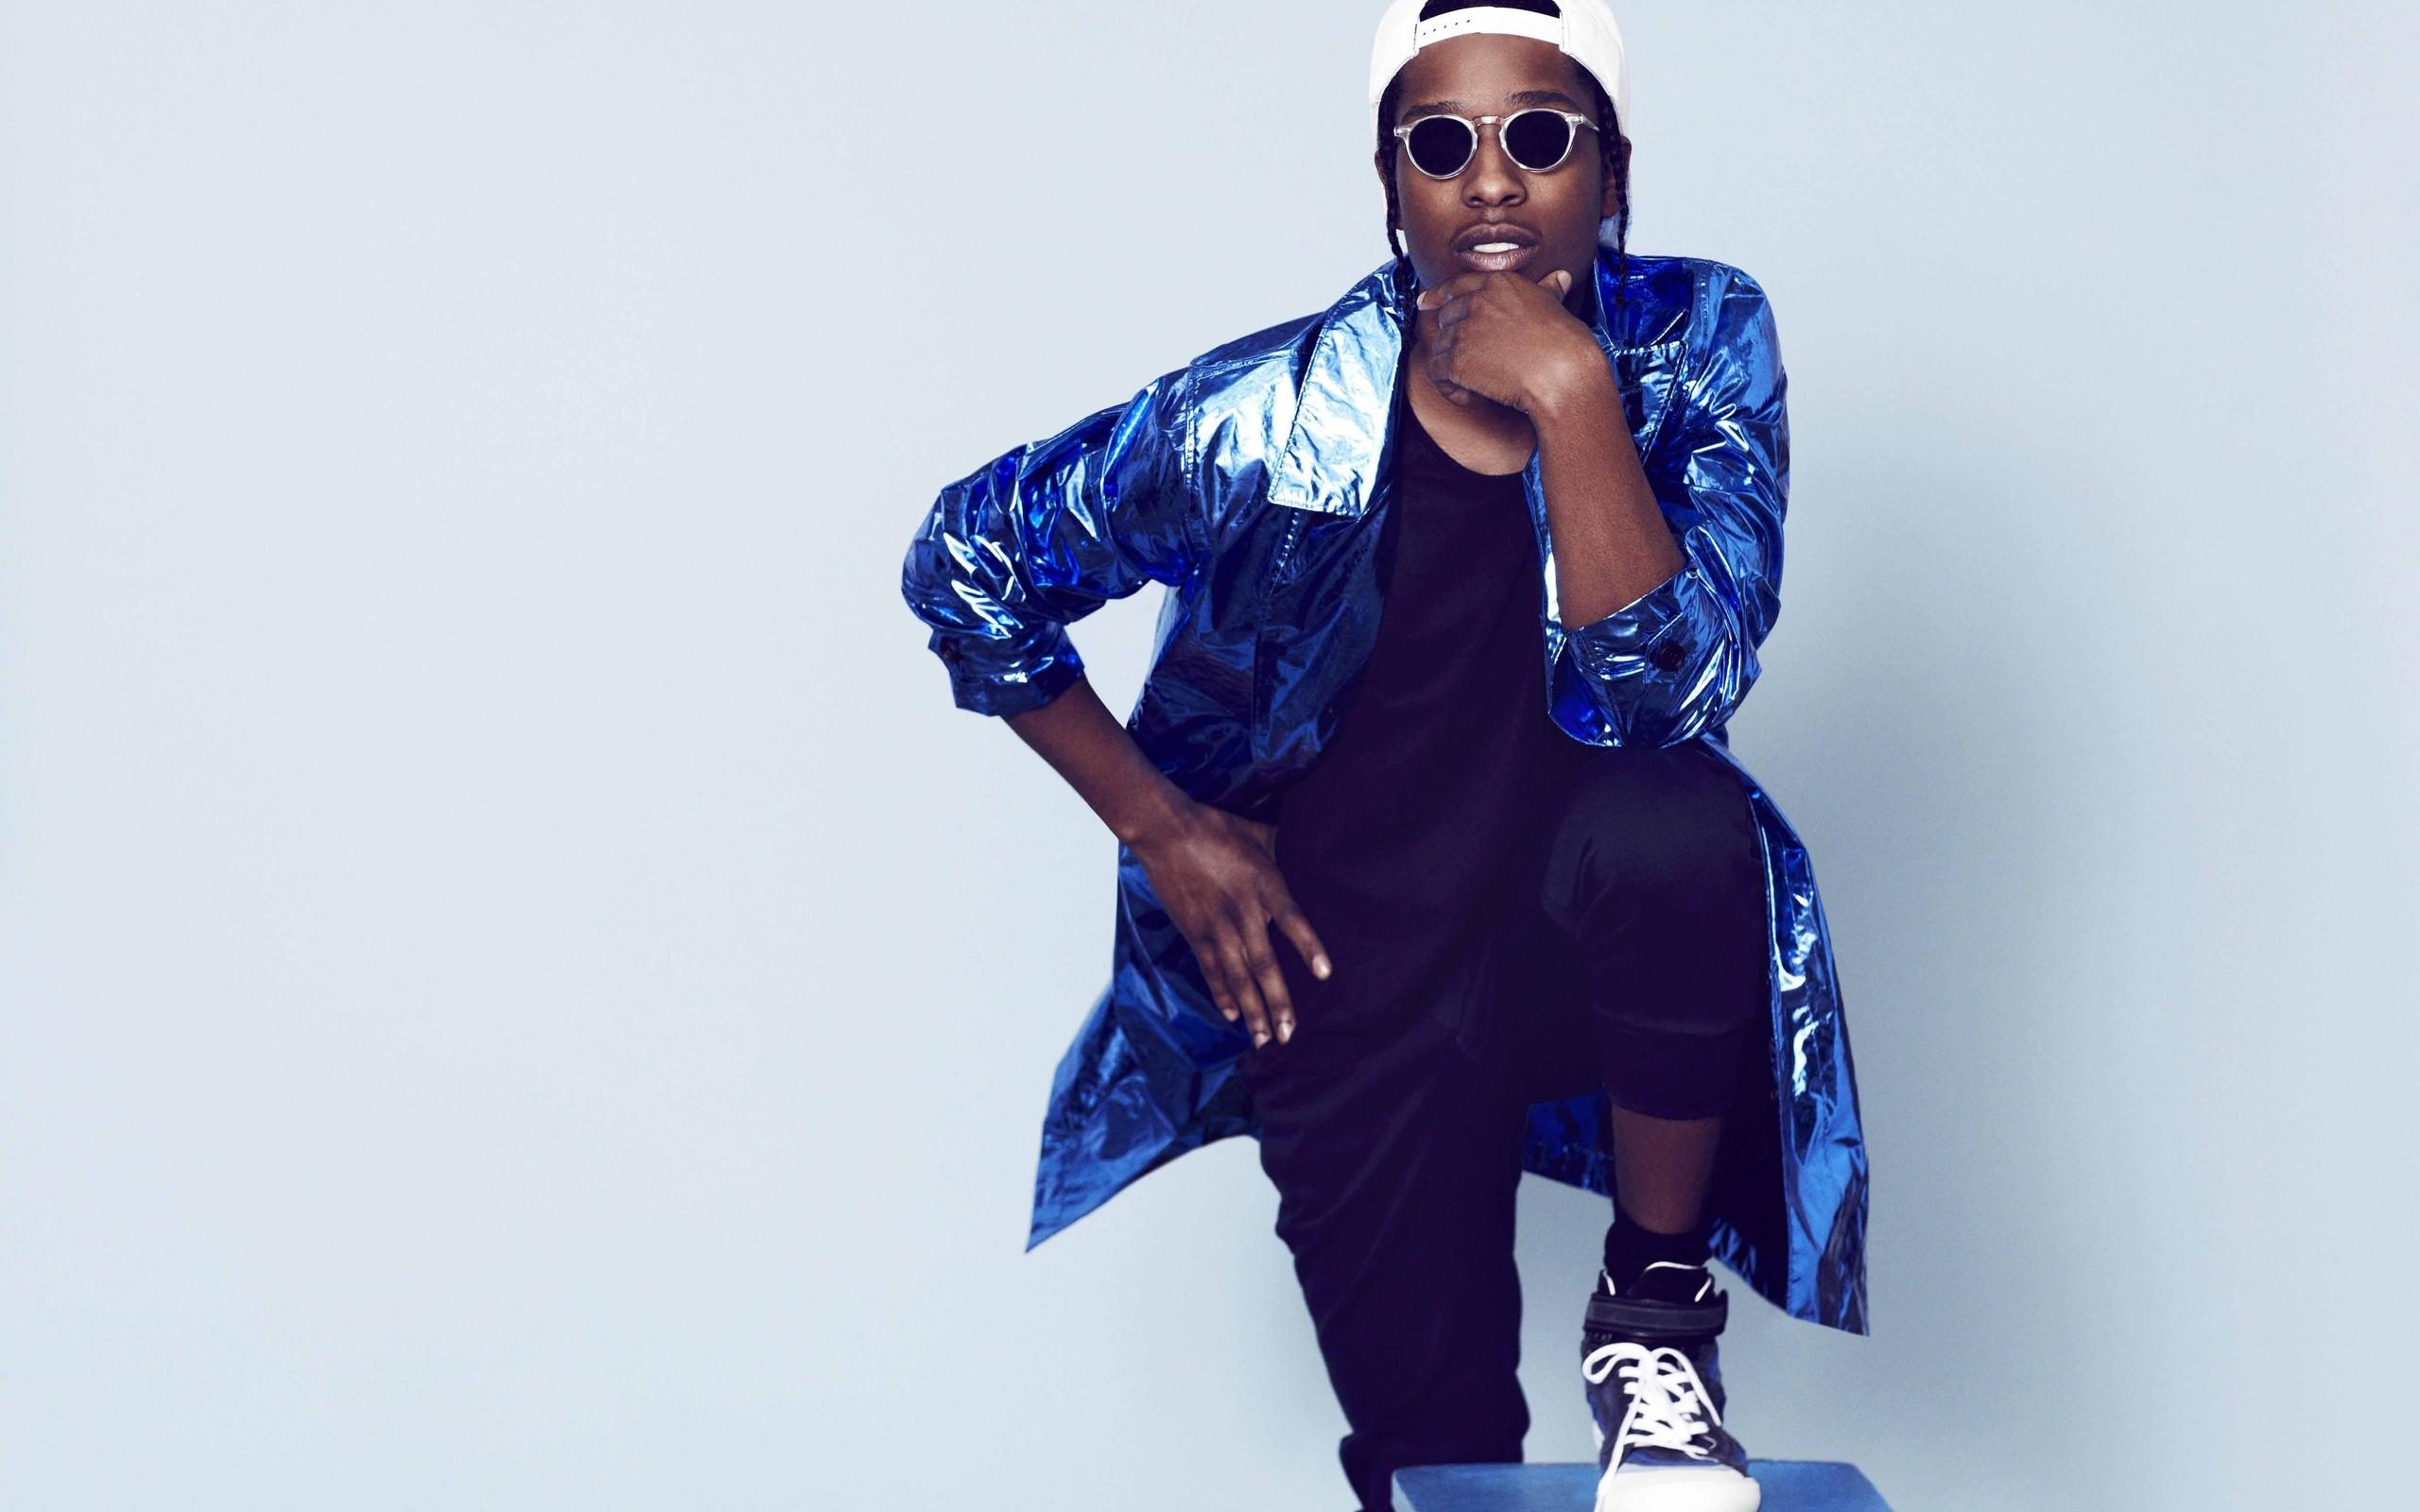 Asap Rocky, Rapper, Singer, Rakim Mayers, Rap, Hip Hop, Hip